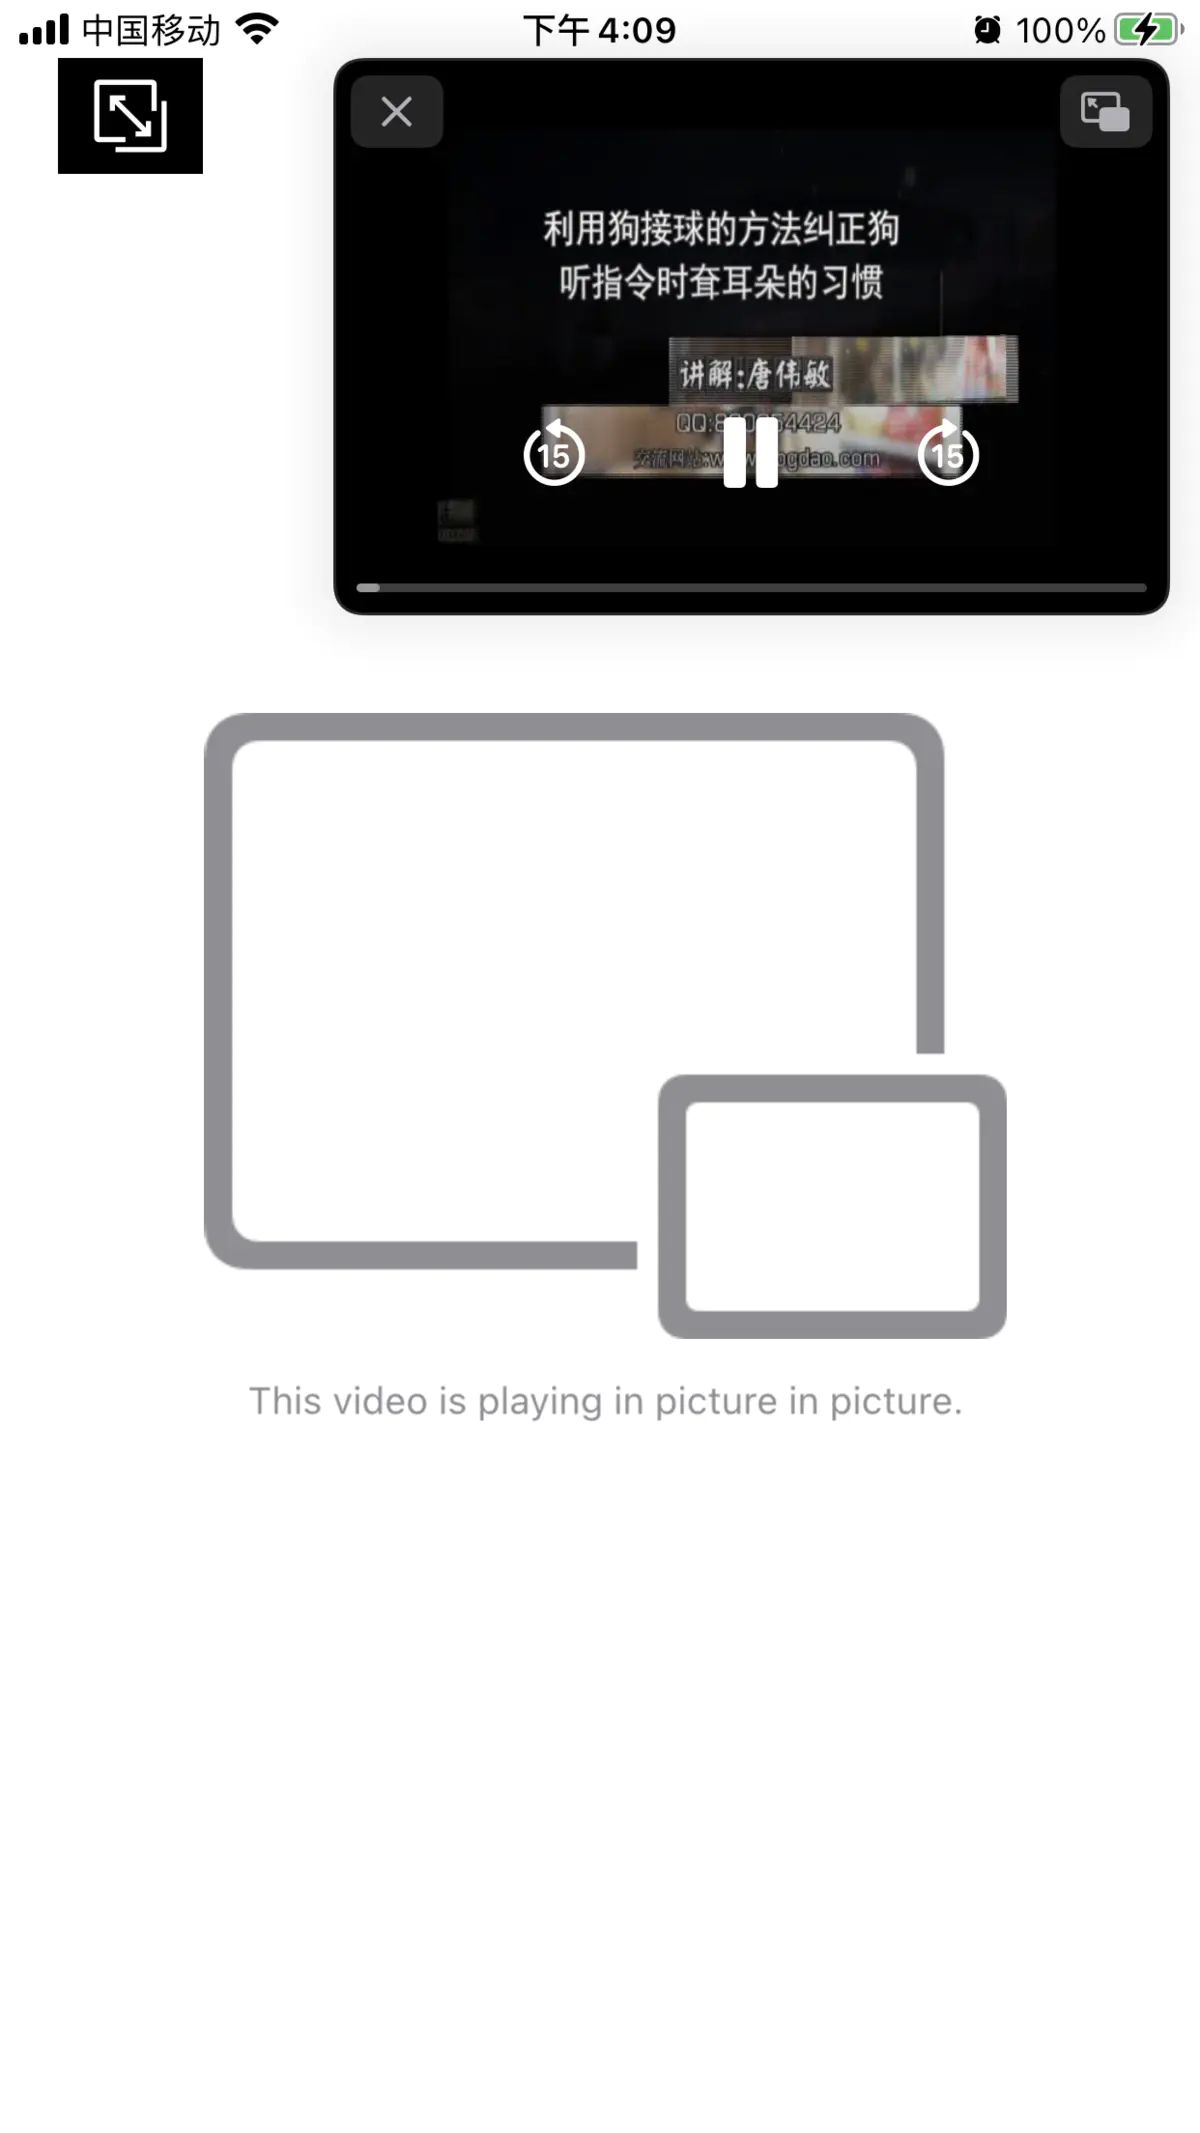 [iOS14]iPhone上画中画效果实现[详细代码]插图(1)